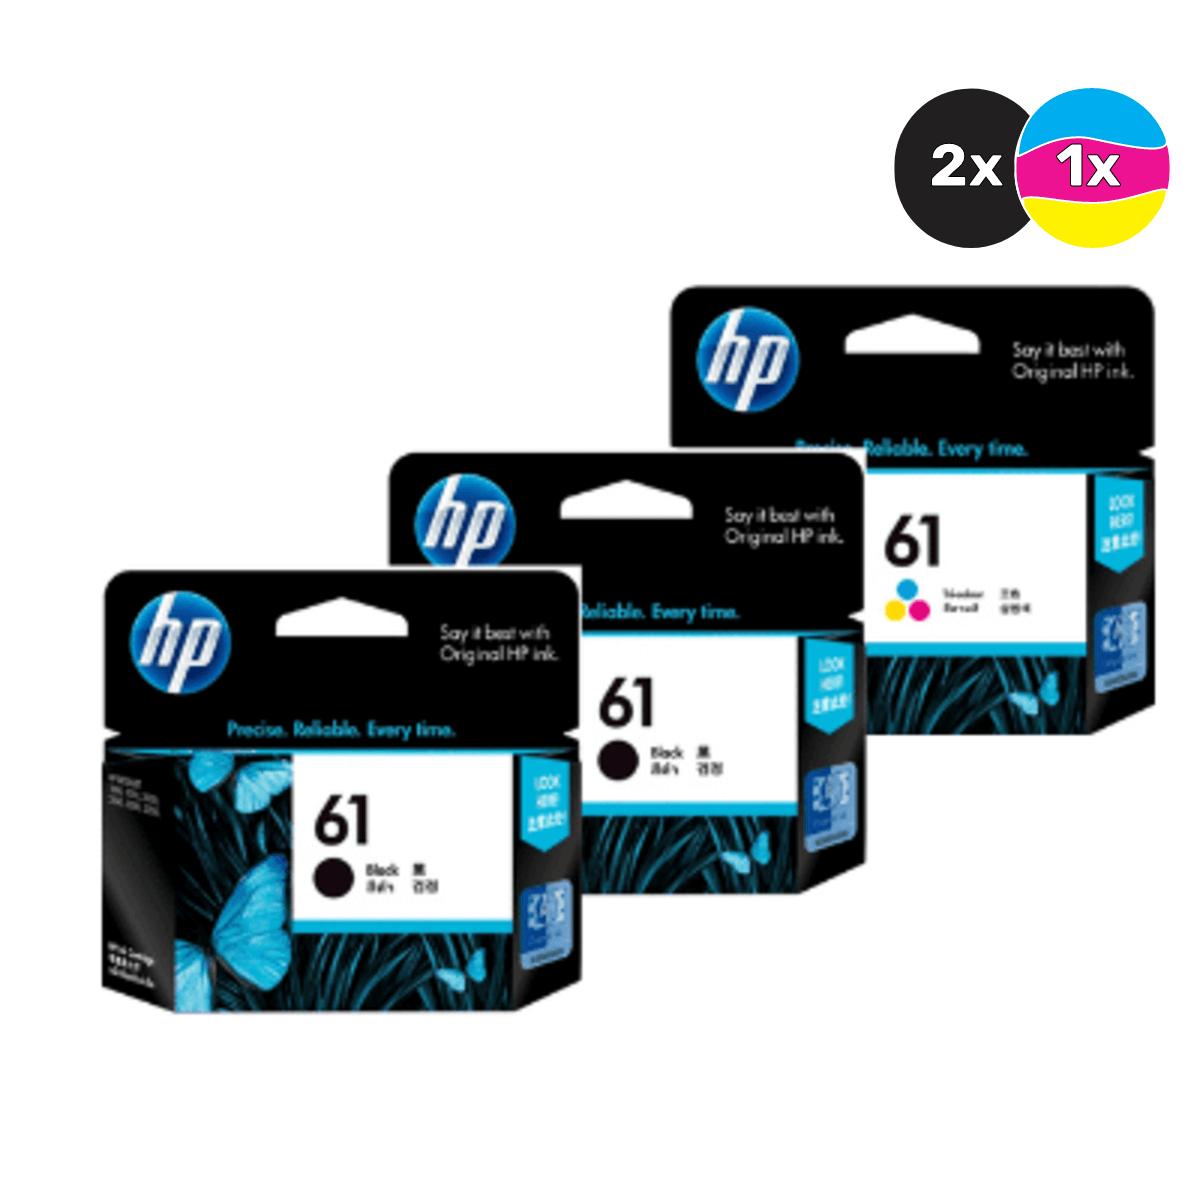 HP 61 Ink Cartridge Value Pack - Includes: [2 x Black, 1 x Tri-Colour]